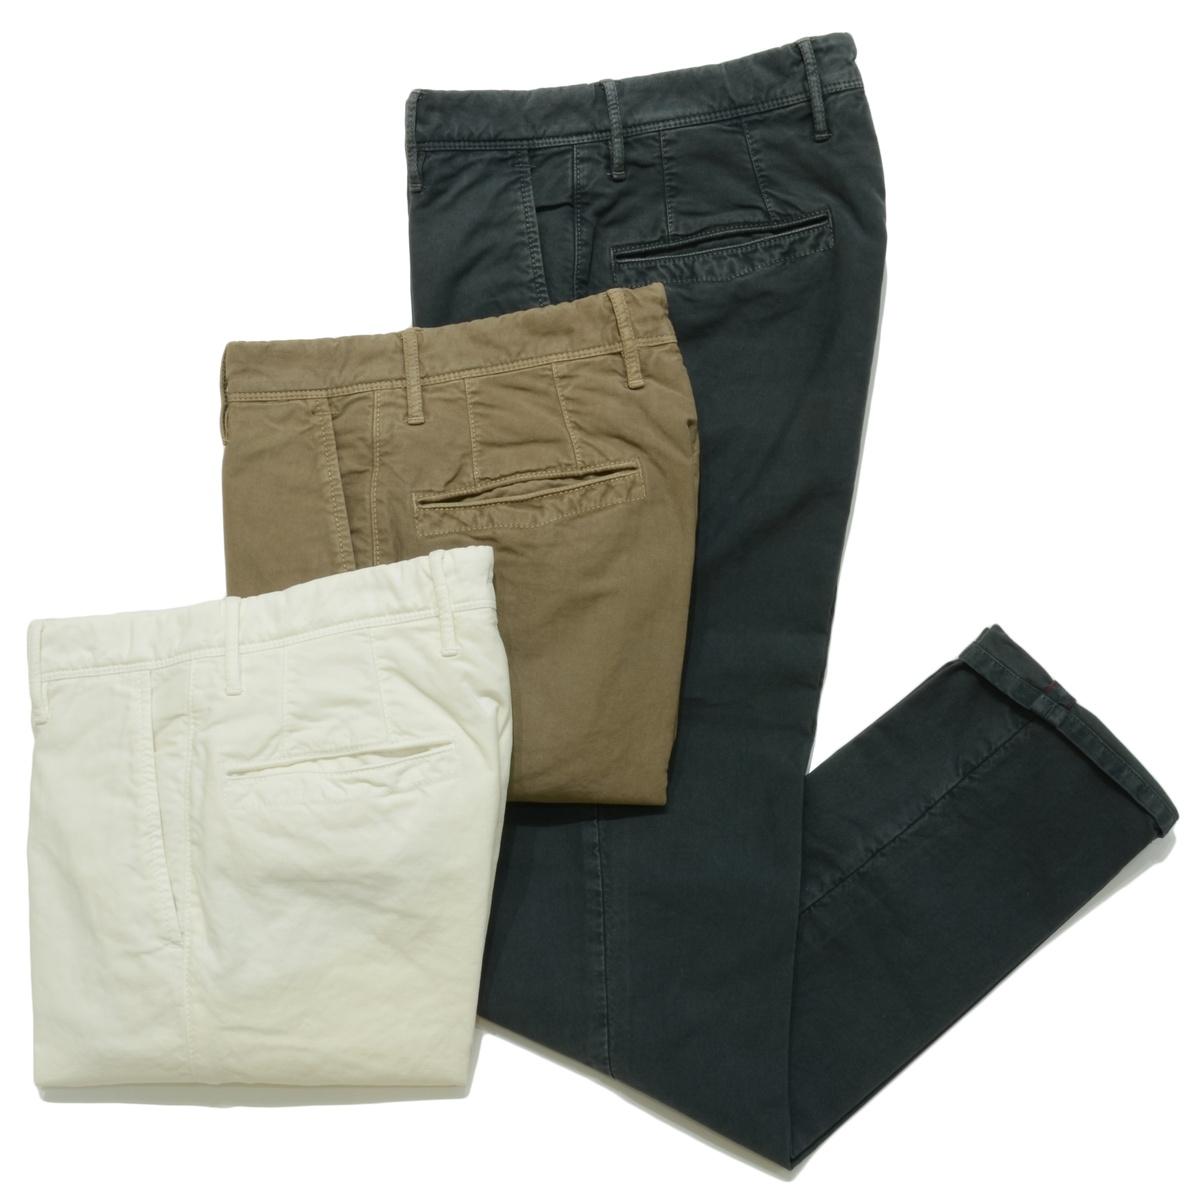 INCOTEX SLACKS 1ST603成衣染色绵伸斜纹圓錐裤子1ST603-4045713052003091